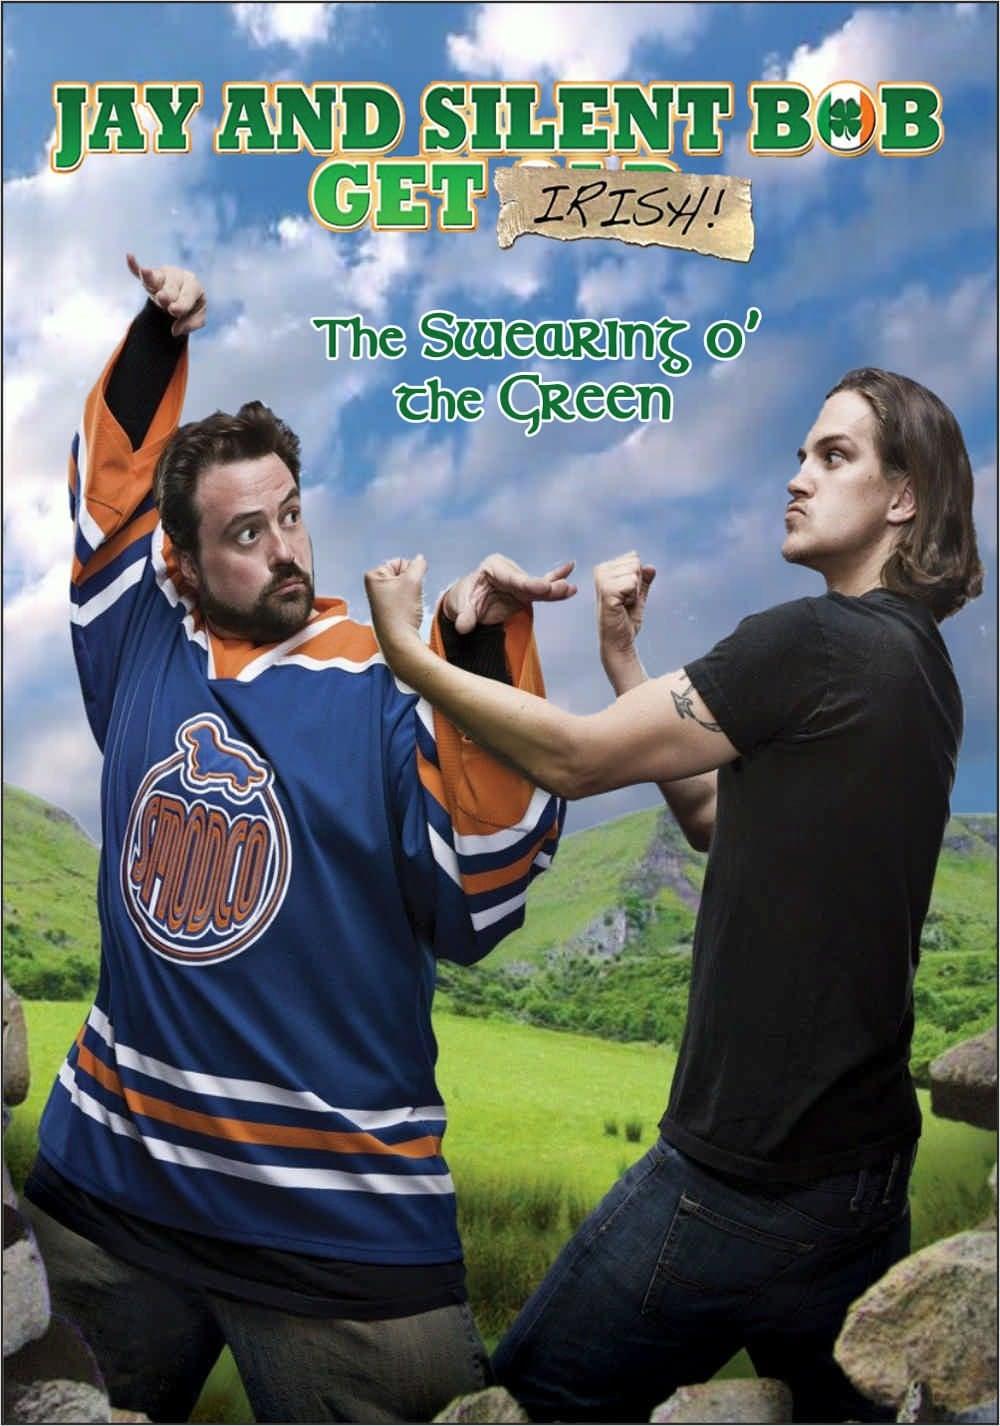 Jay and Silent Bob Get Irish: The Swearing o' The Green!